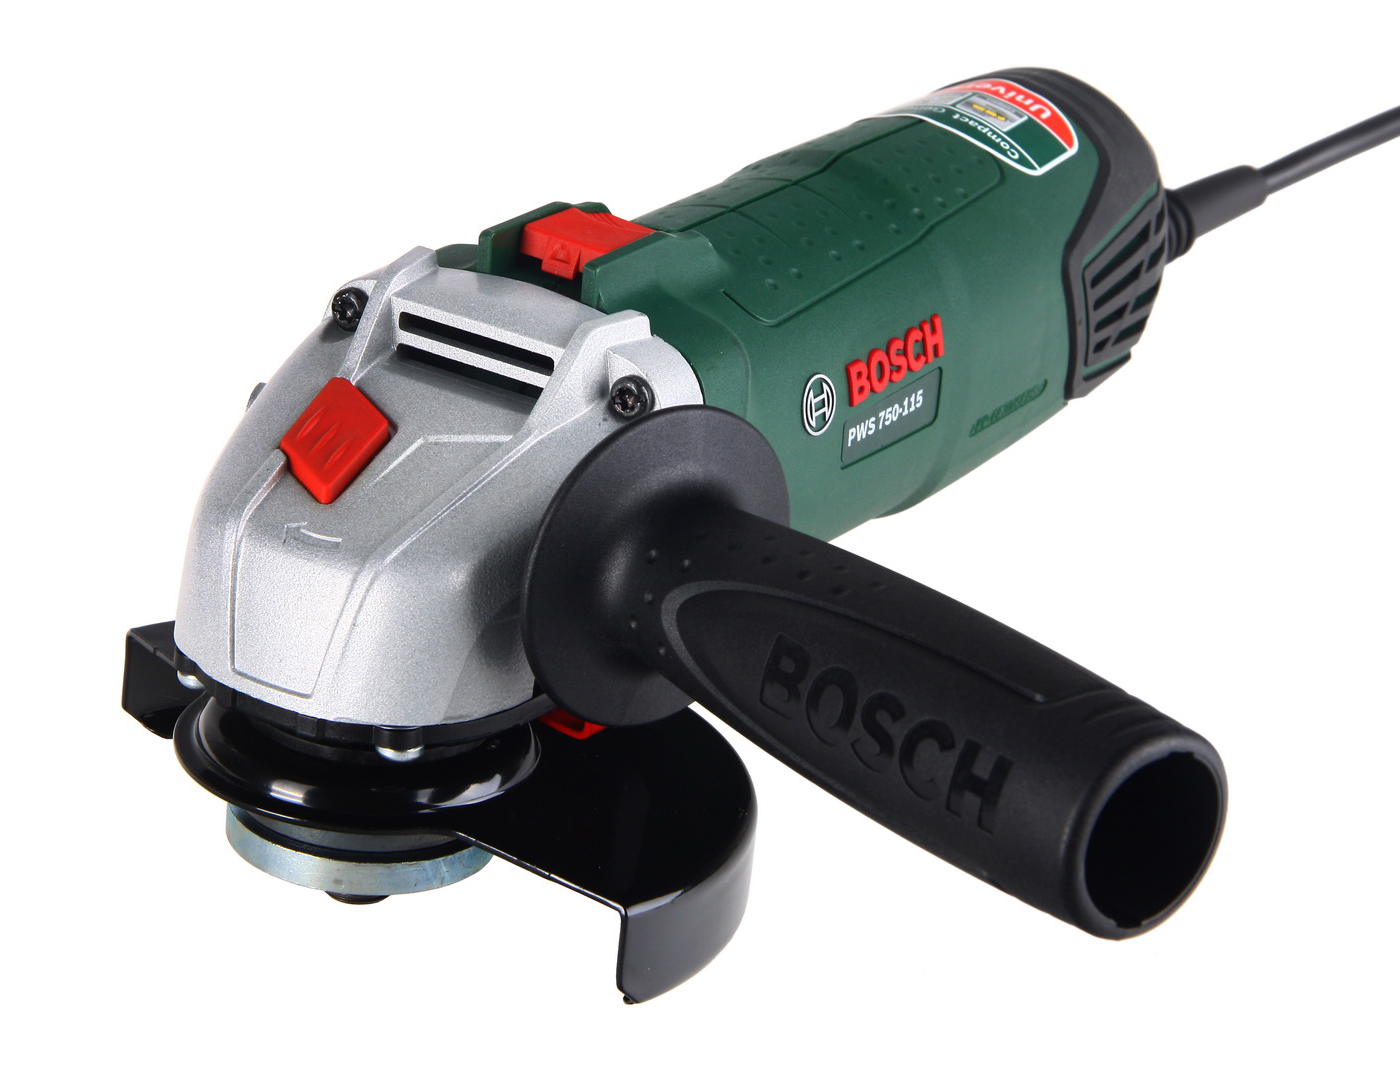 УШМ (болгарка) Bosch Pws 750-115 (0.603.3a2.420) ушм болгарка bosch pws 700 115 0 603 3a2 020